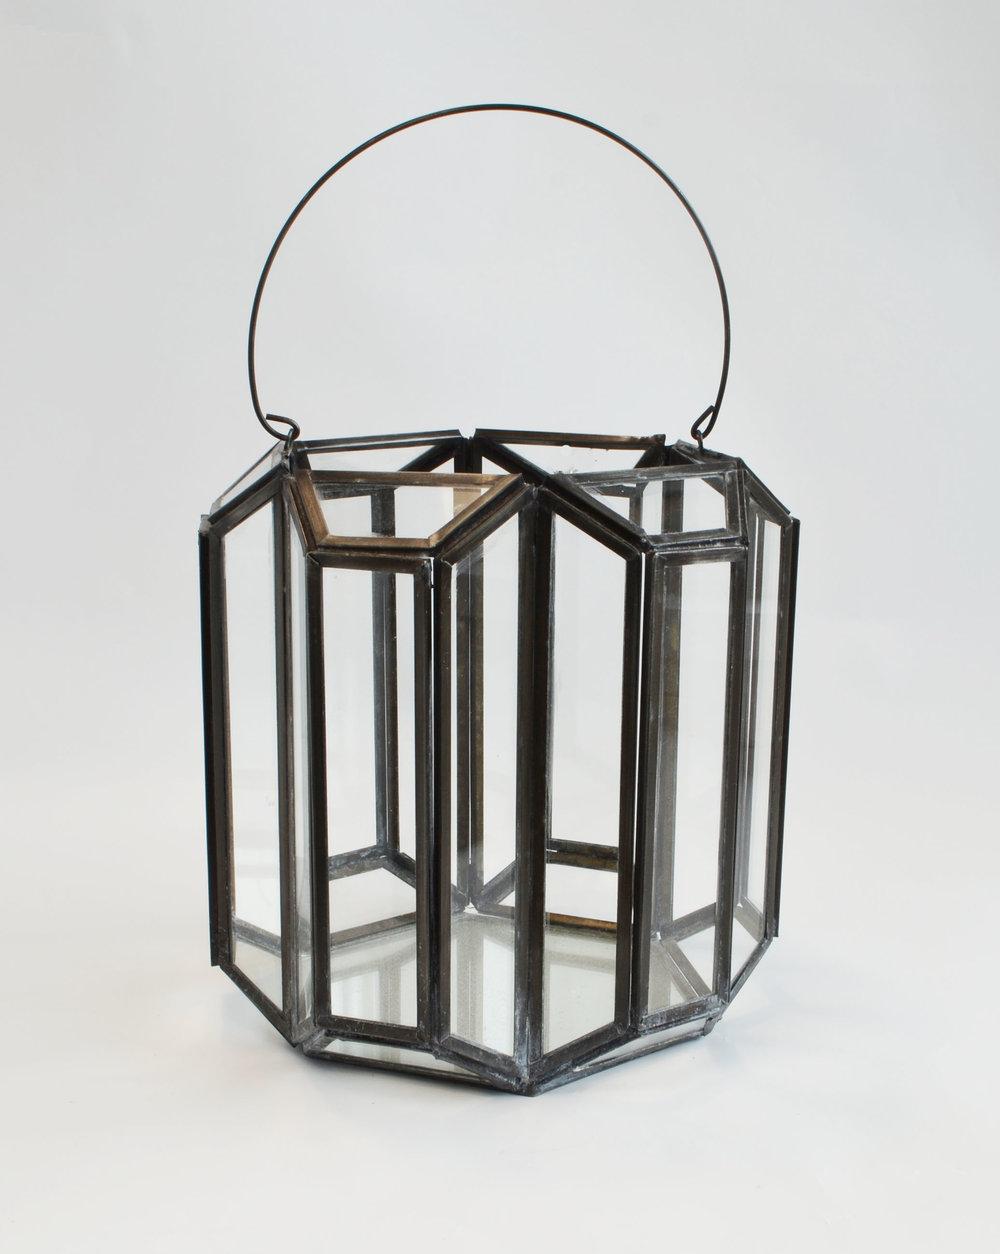 Motley lantern  Black + glass geometric  Quantity: 2  Price: $20.00